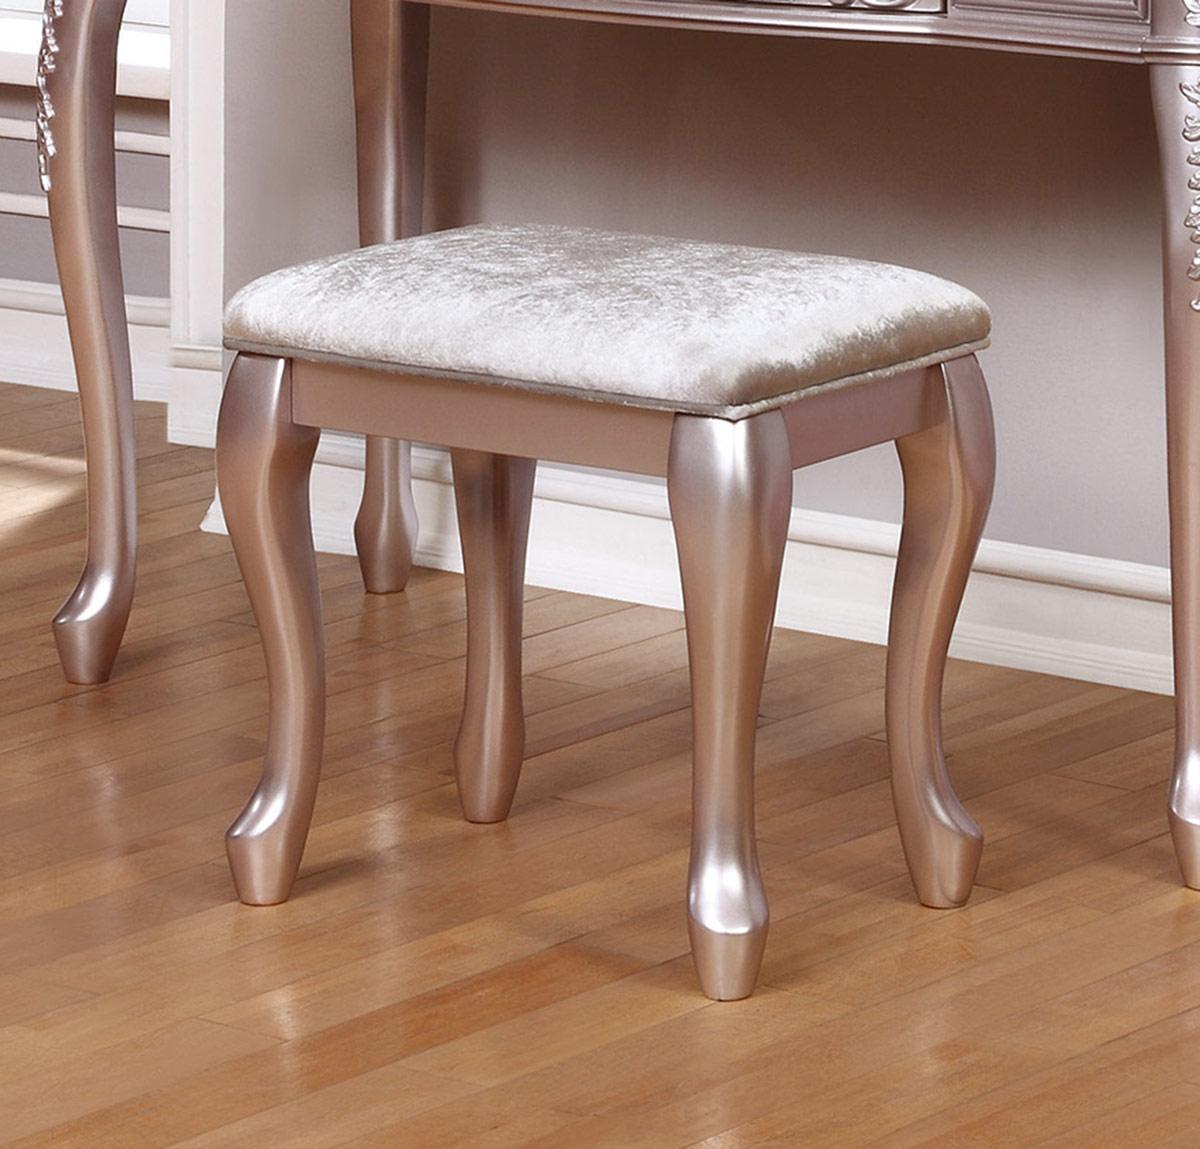 Coaster Caroline Vanity Stool - Metallic Lilac